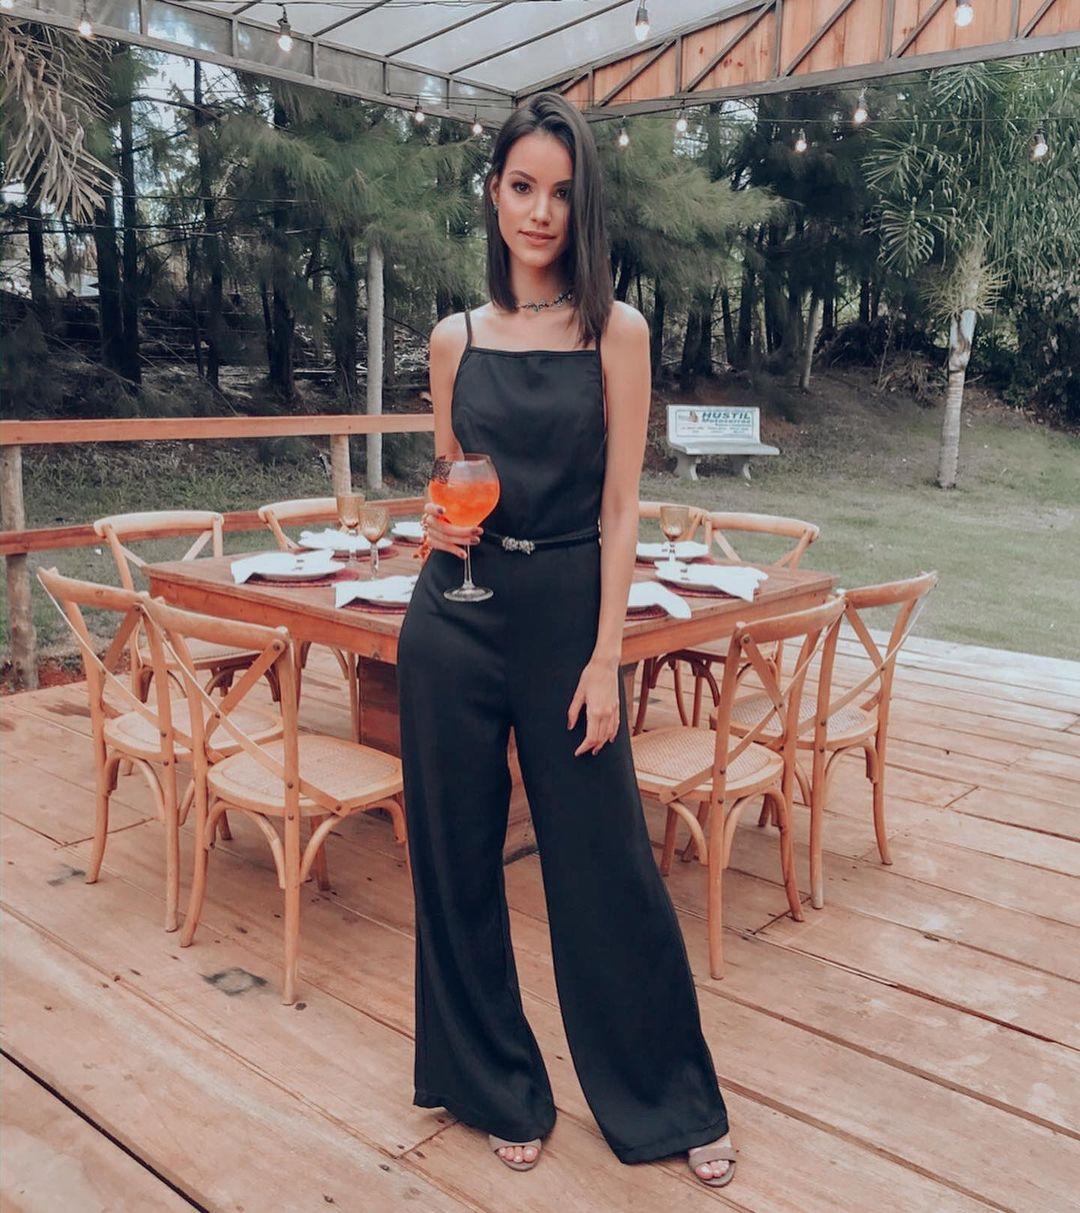 rafaella felipe, top 20 de miss brasil mundo 2019. - Página 4 10691011